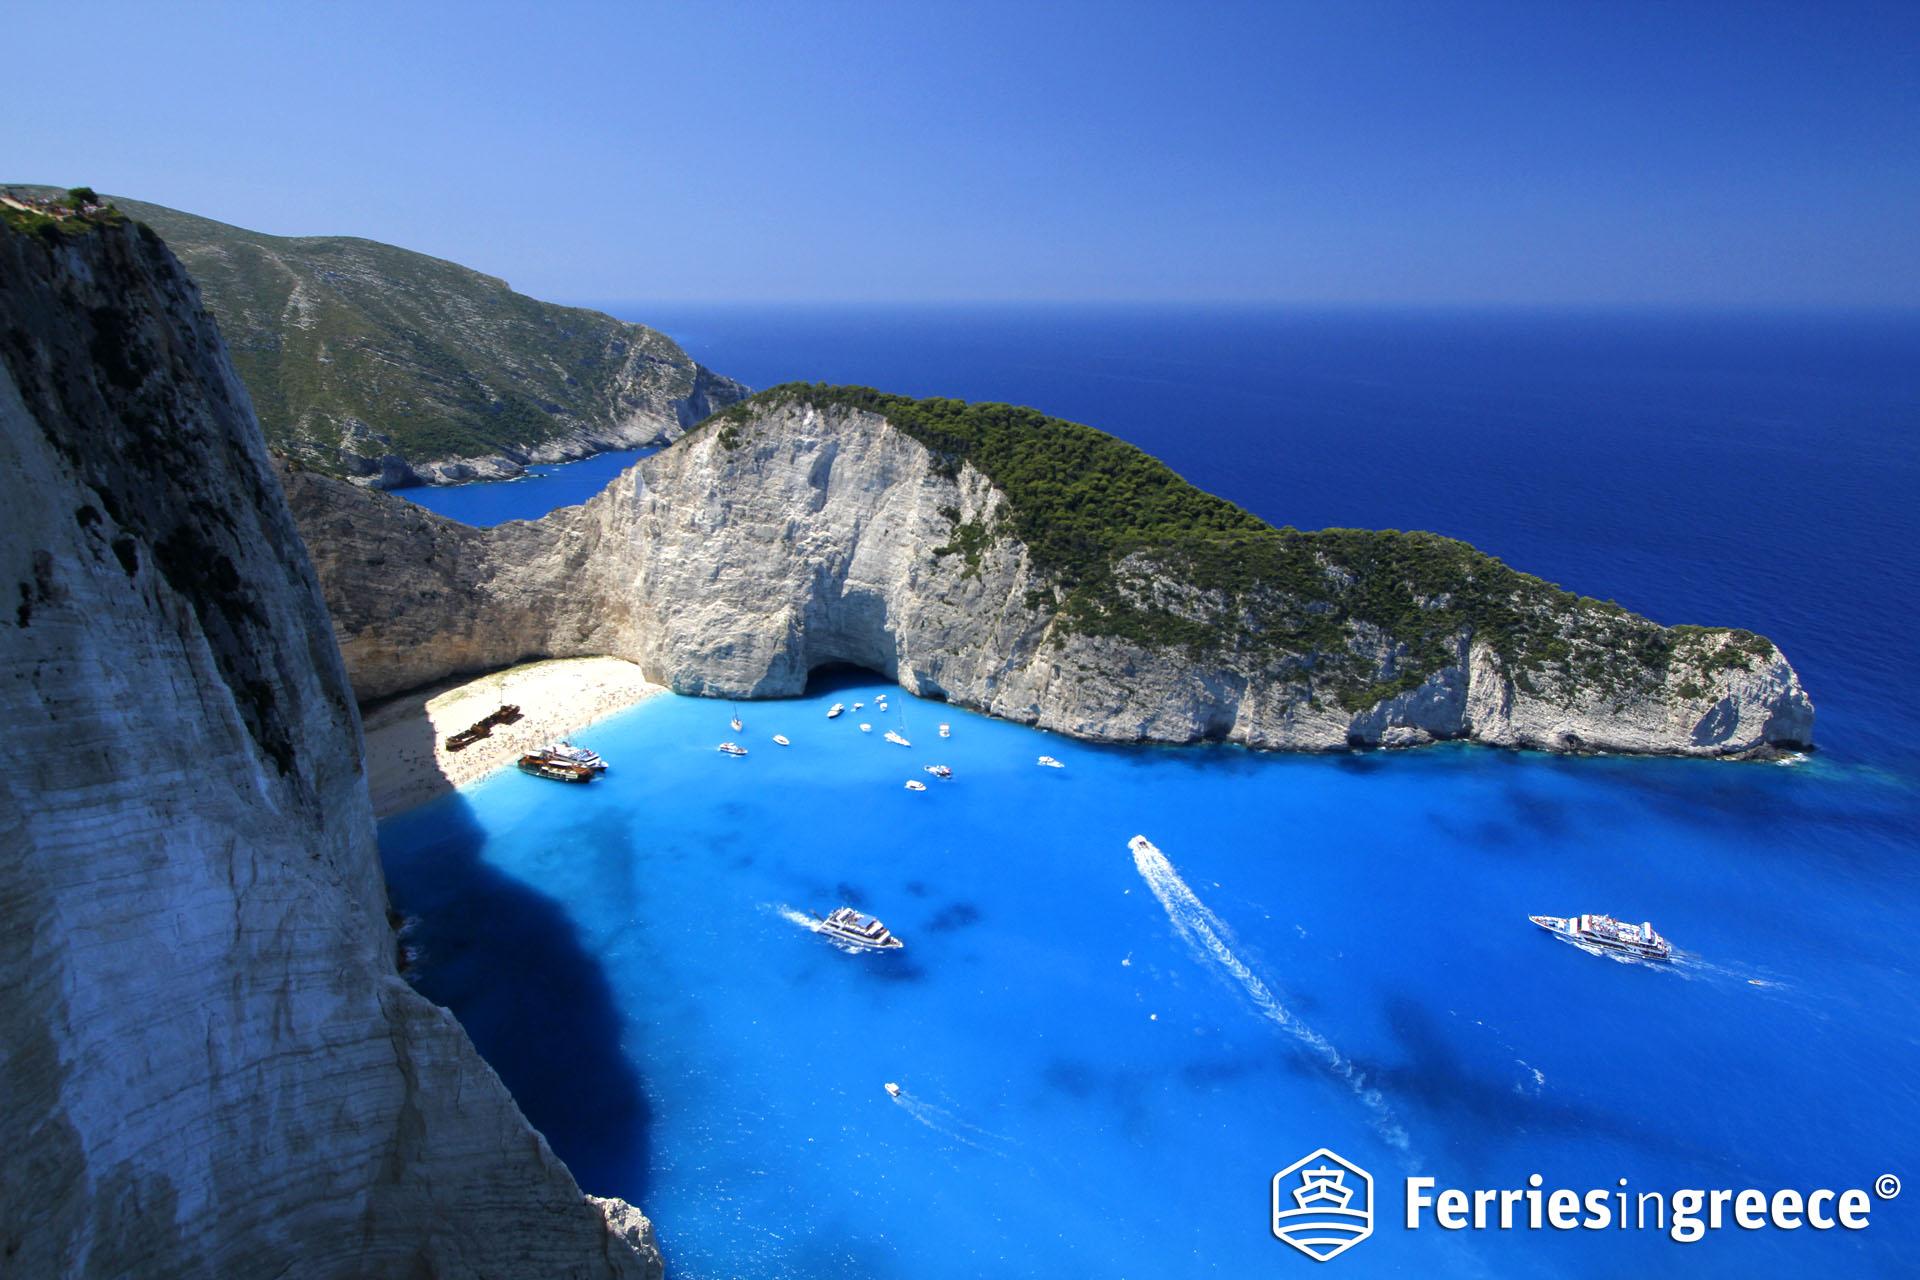 Best beaches in the Greek islands: Navagio or the Shipwreck beach